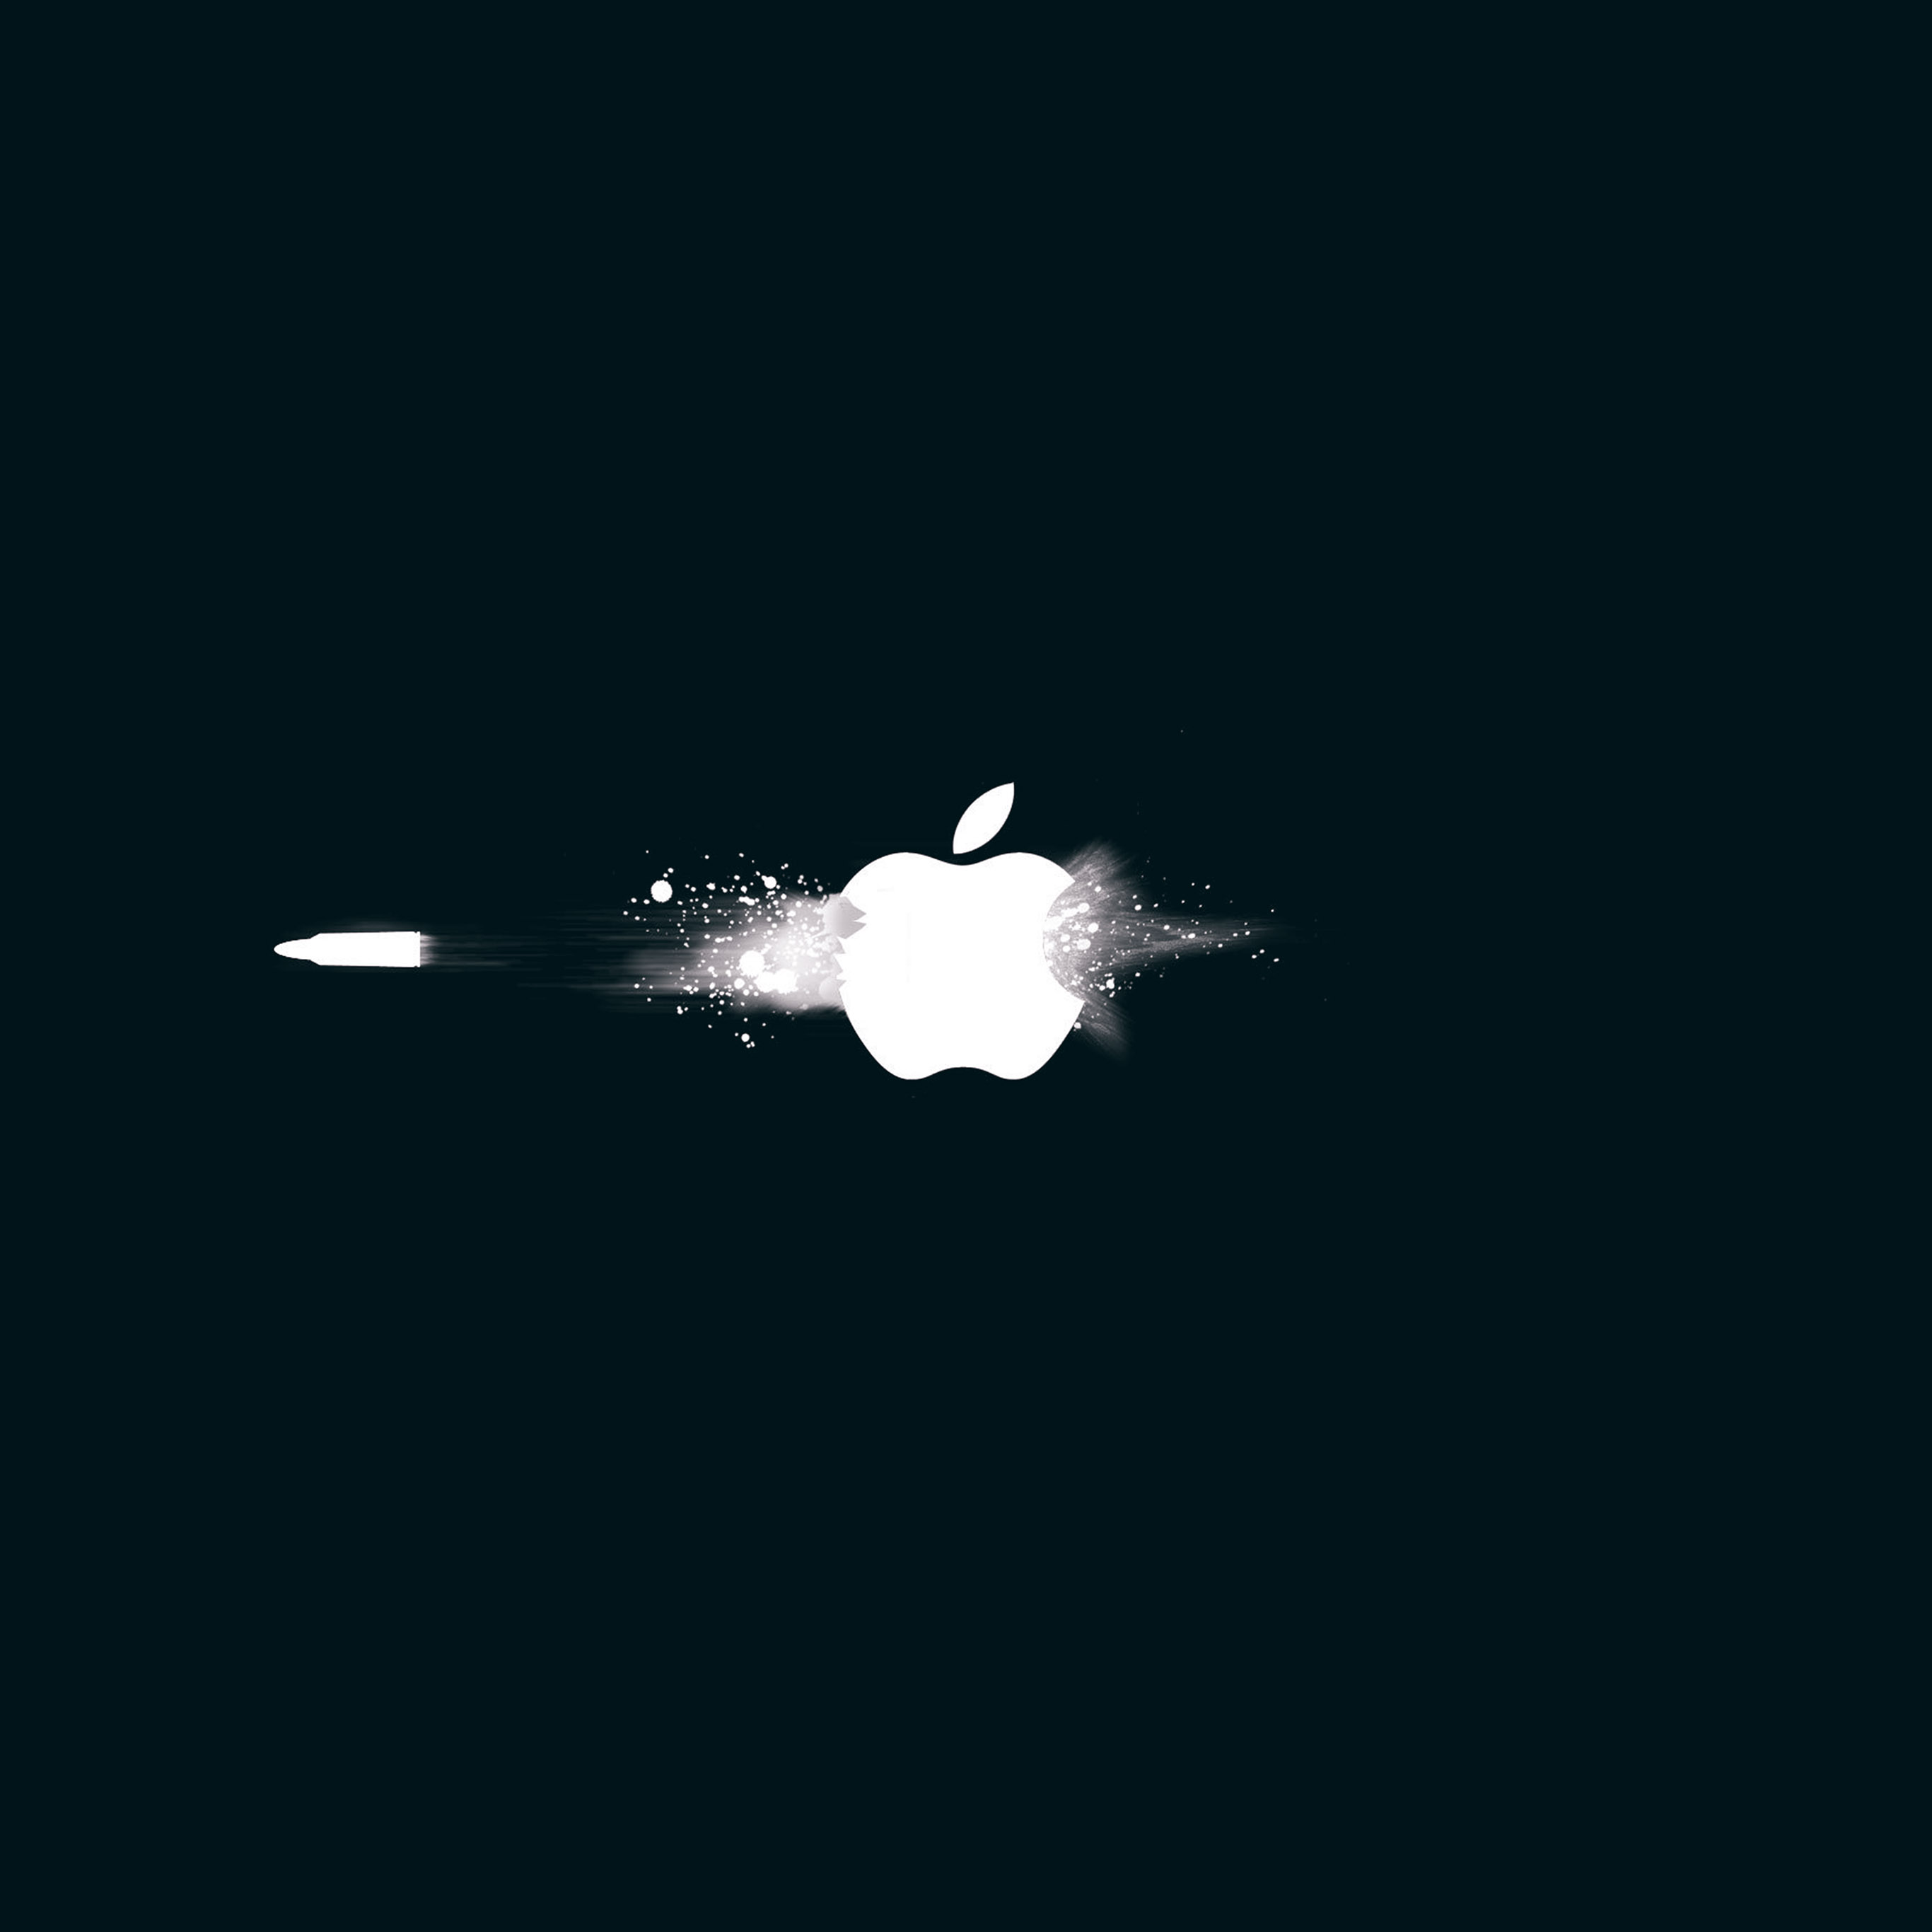 ay47 apple logo ihate